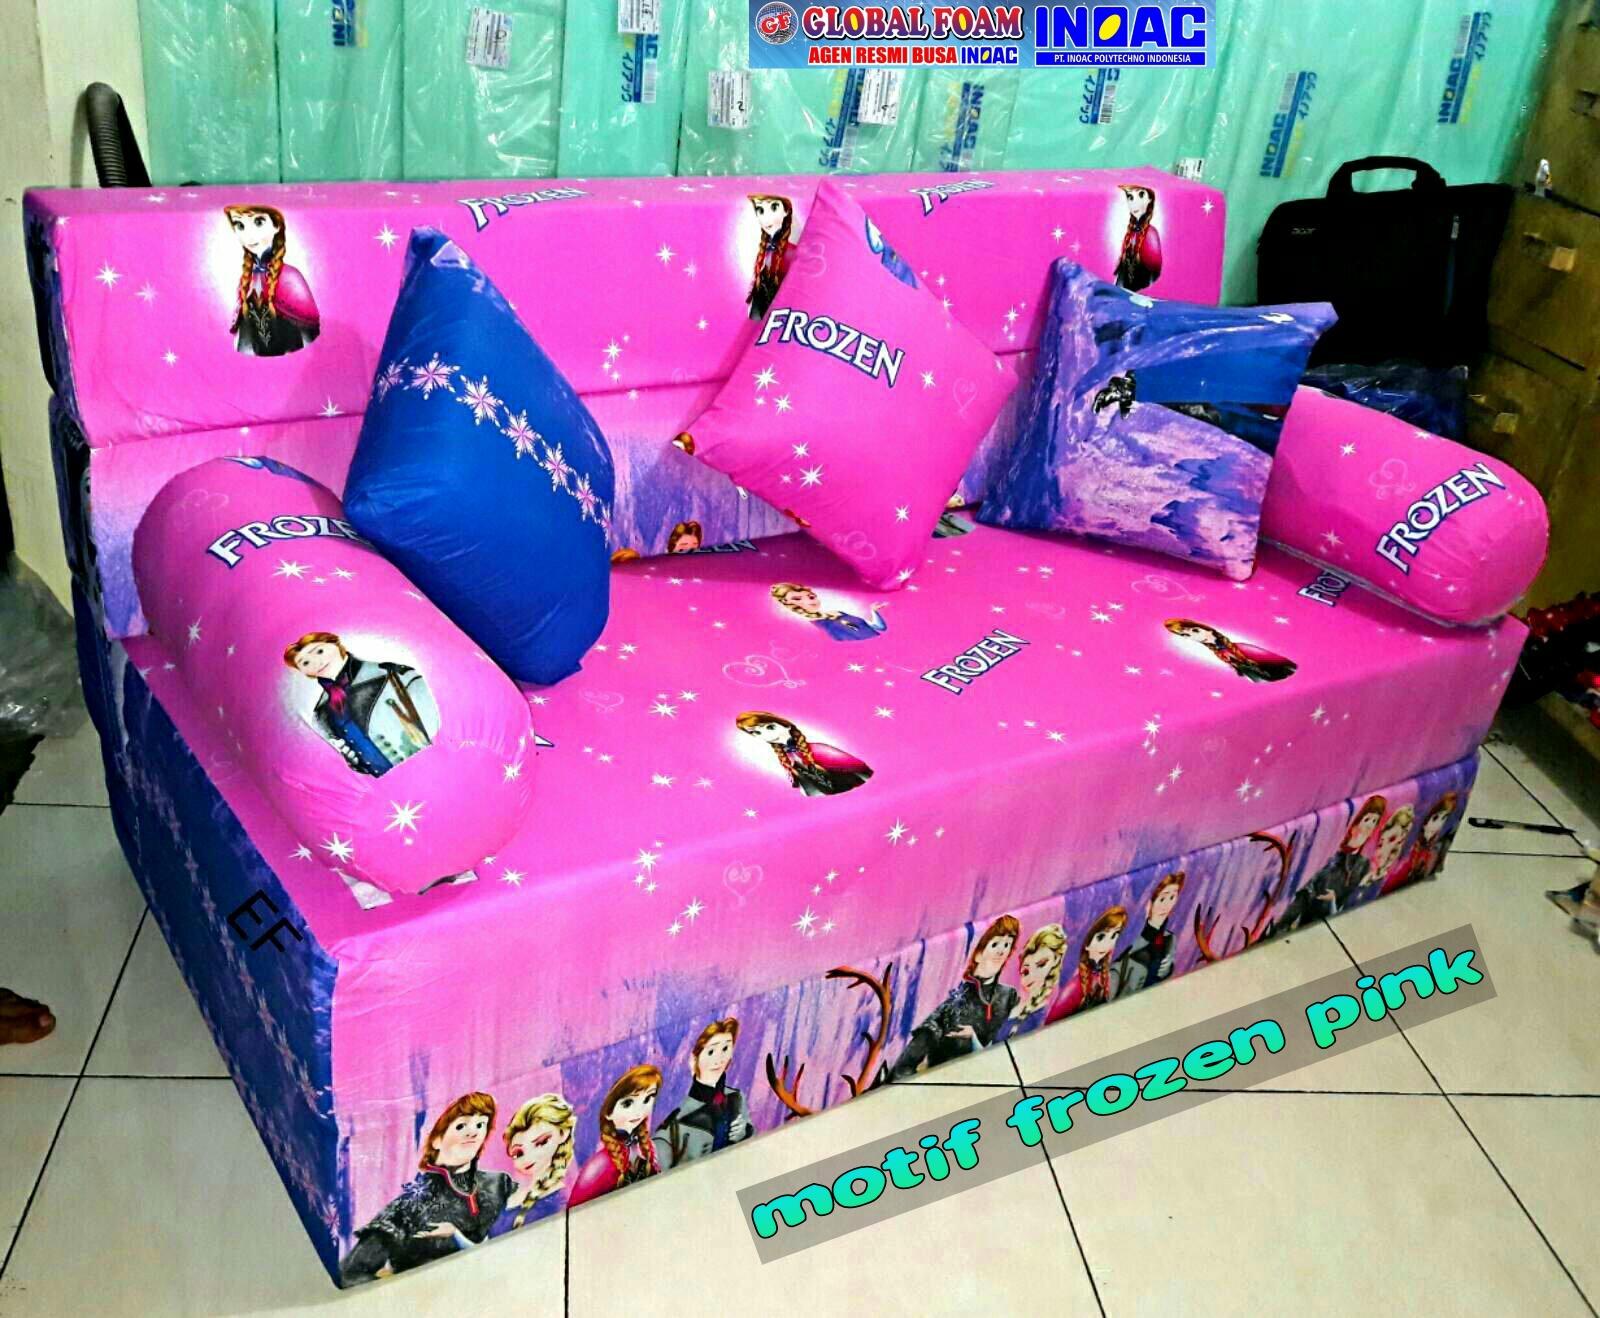 Harga Sofa Bed Inoac No 1 Round Pillows Kasur 2018 Distributor Busa Asli Global